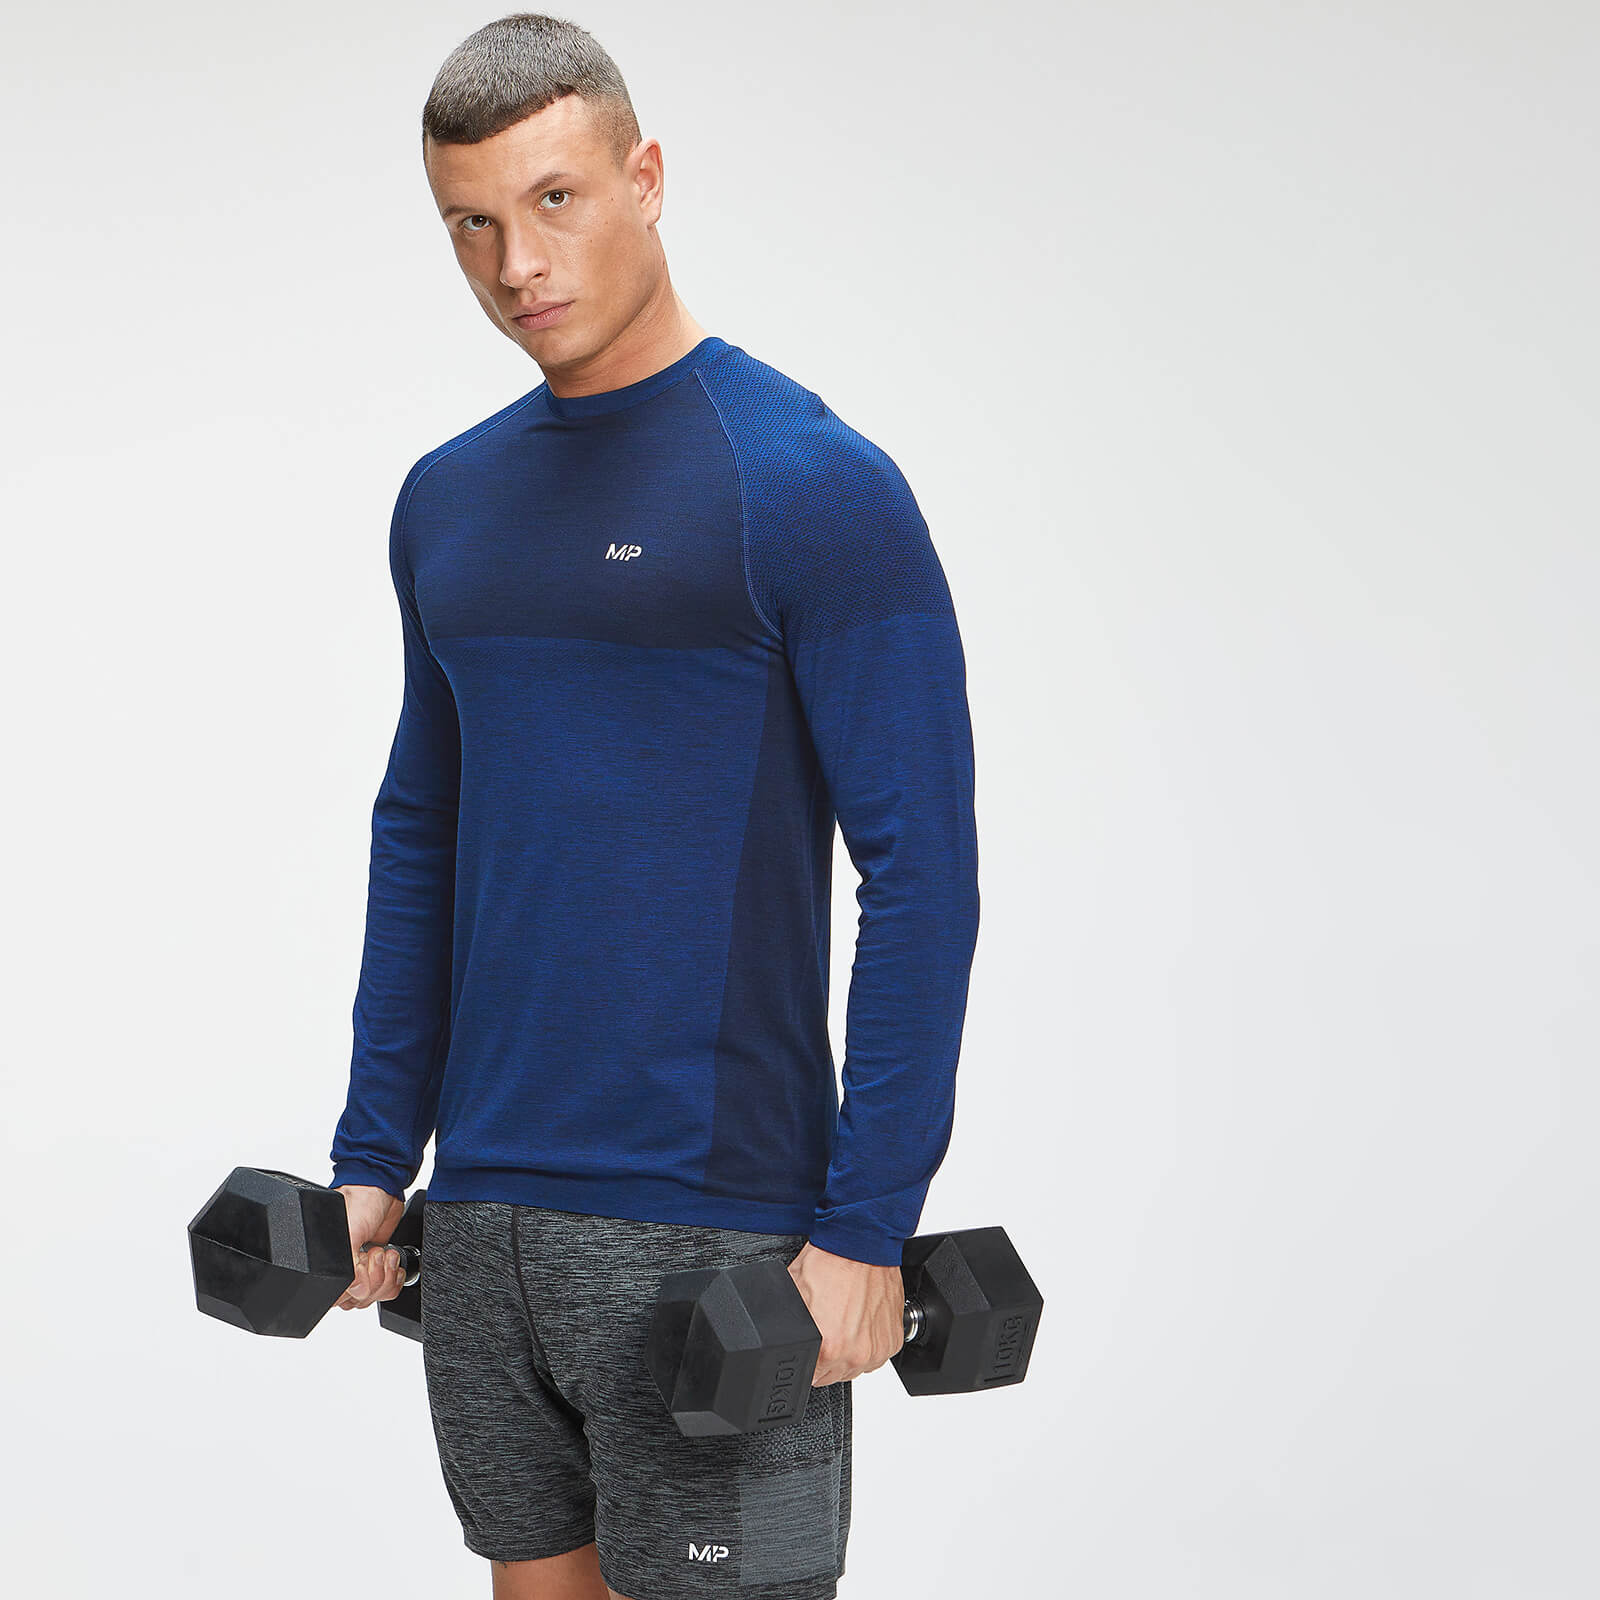 Купить MP Men's Essential Seamless Long Sleeve Top - Intense Blue Marl - XXL, Myprotein International